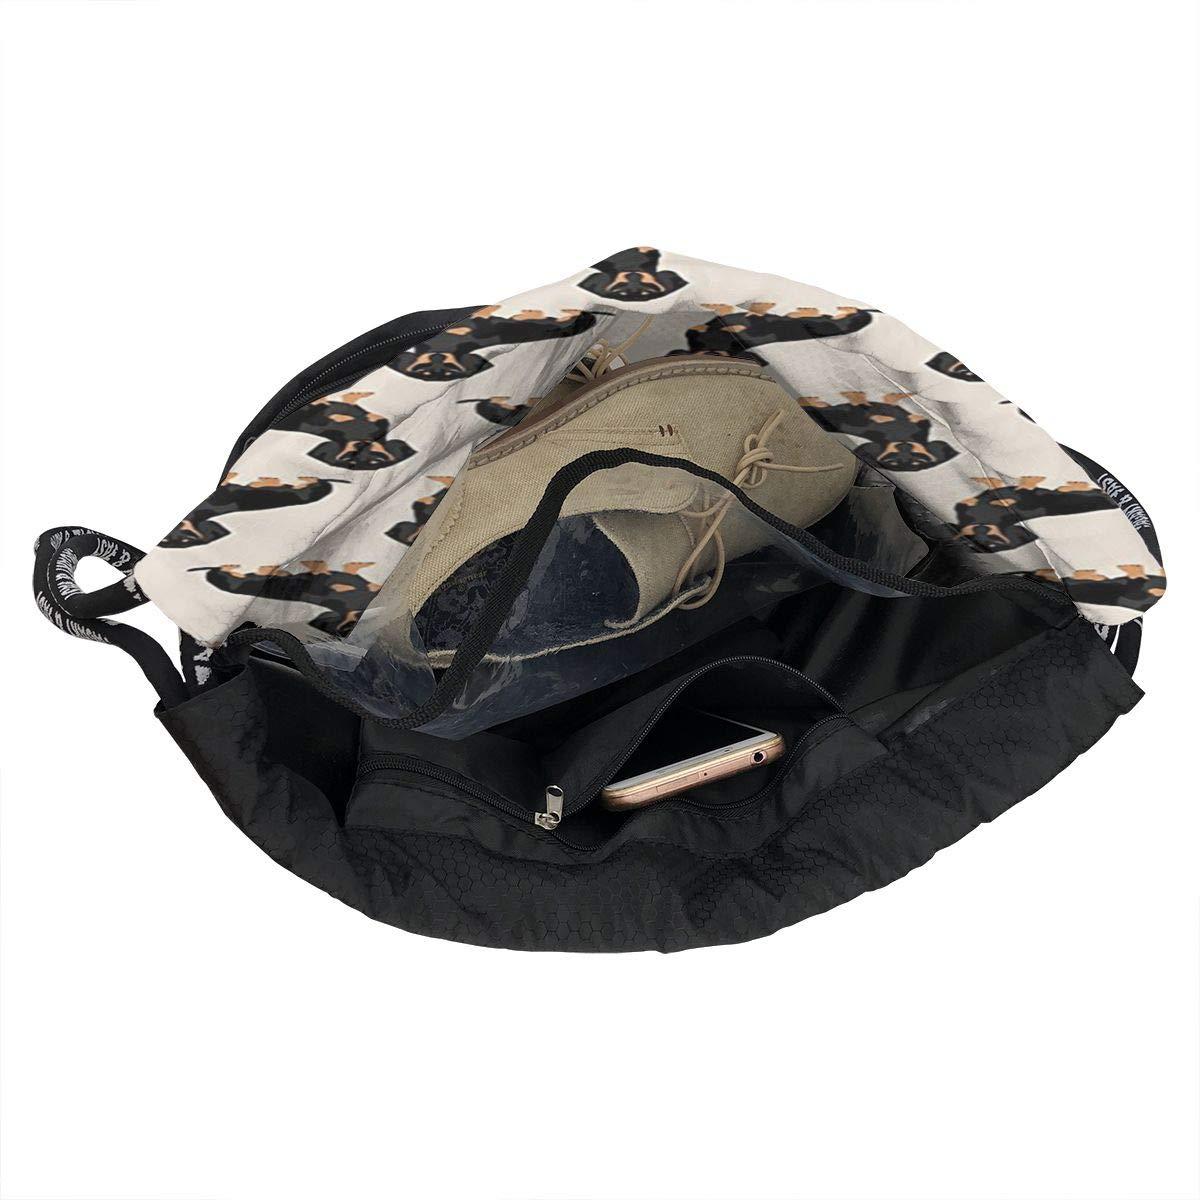 Zol1Q Lightweight Waterproof Large Storage Drawstring Bag for Men /& Women Black Dogs Cinch Backpack Sackpack Tote Sack